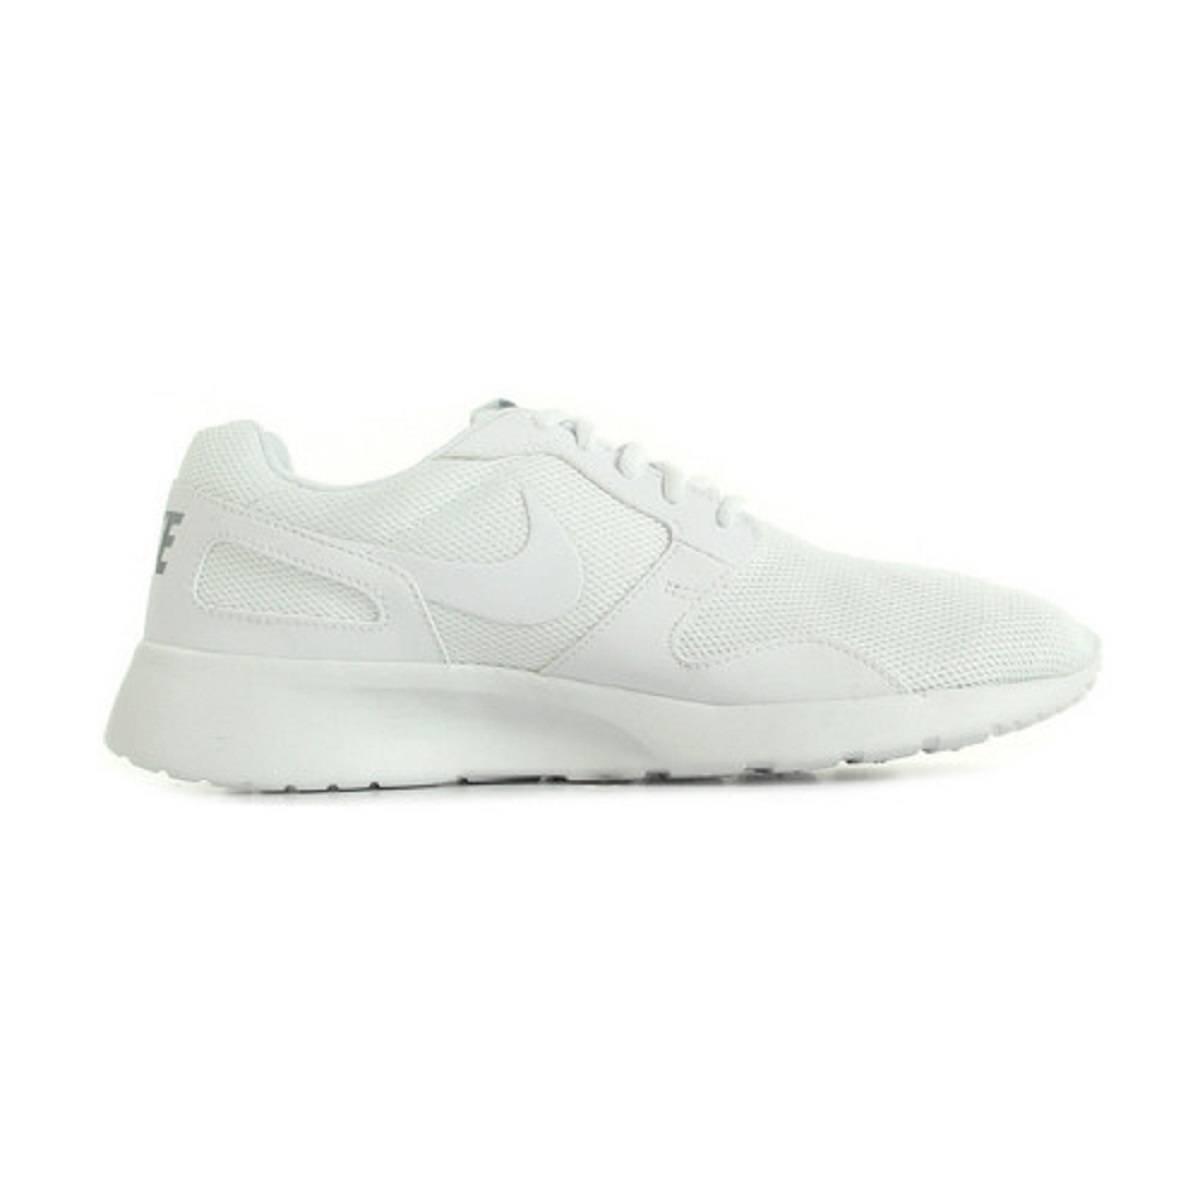 Nike Kaishi 654473111, Turnschuhe  8,5 White/White-wolf Grey